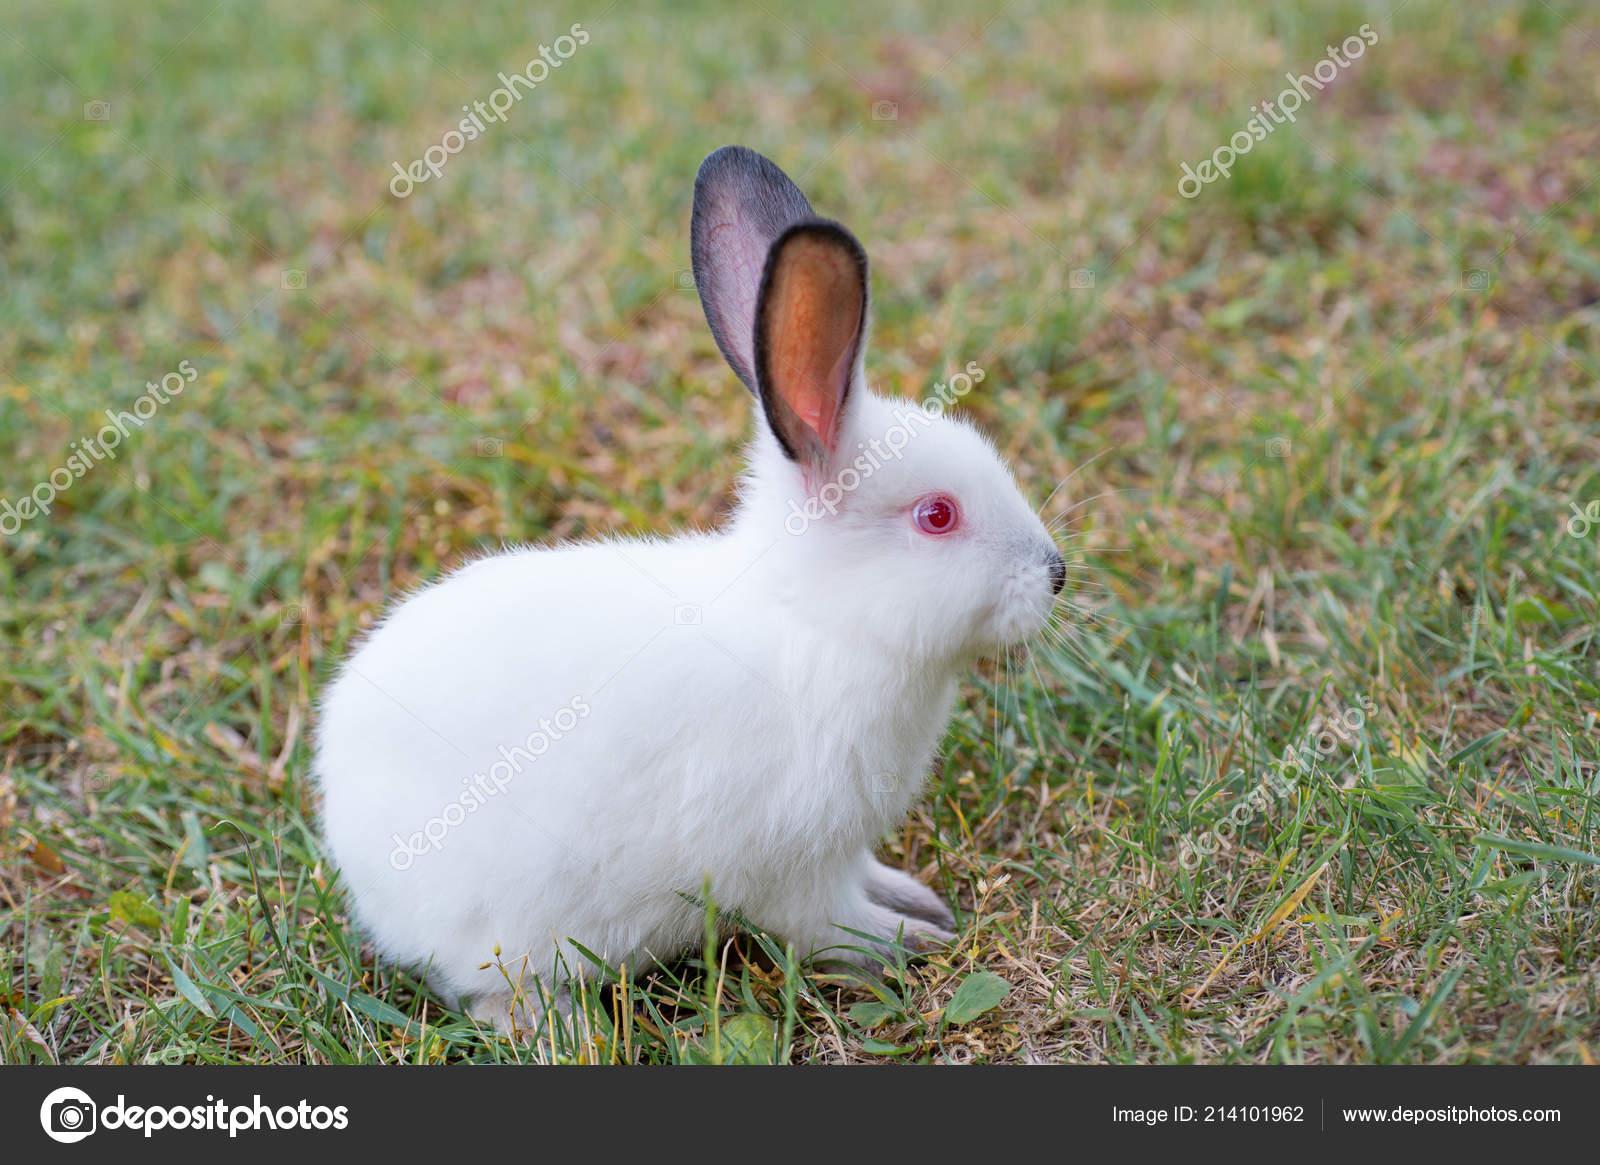 f6d168f90fae Μικροσκοπικό Χνουδωτό Λευκό Κουνέλι Κόκκινα Μάτια Συνεδρίαση Για ...